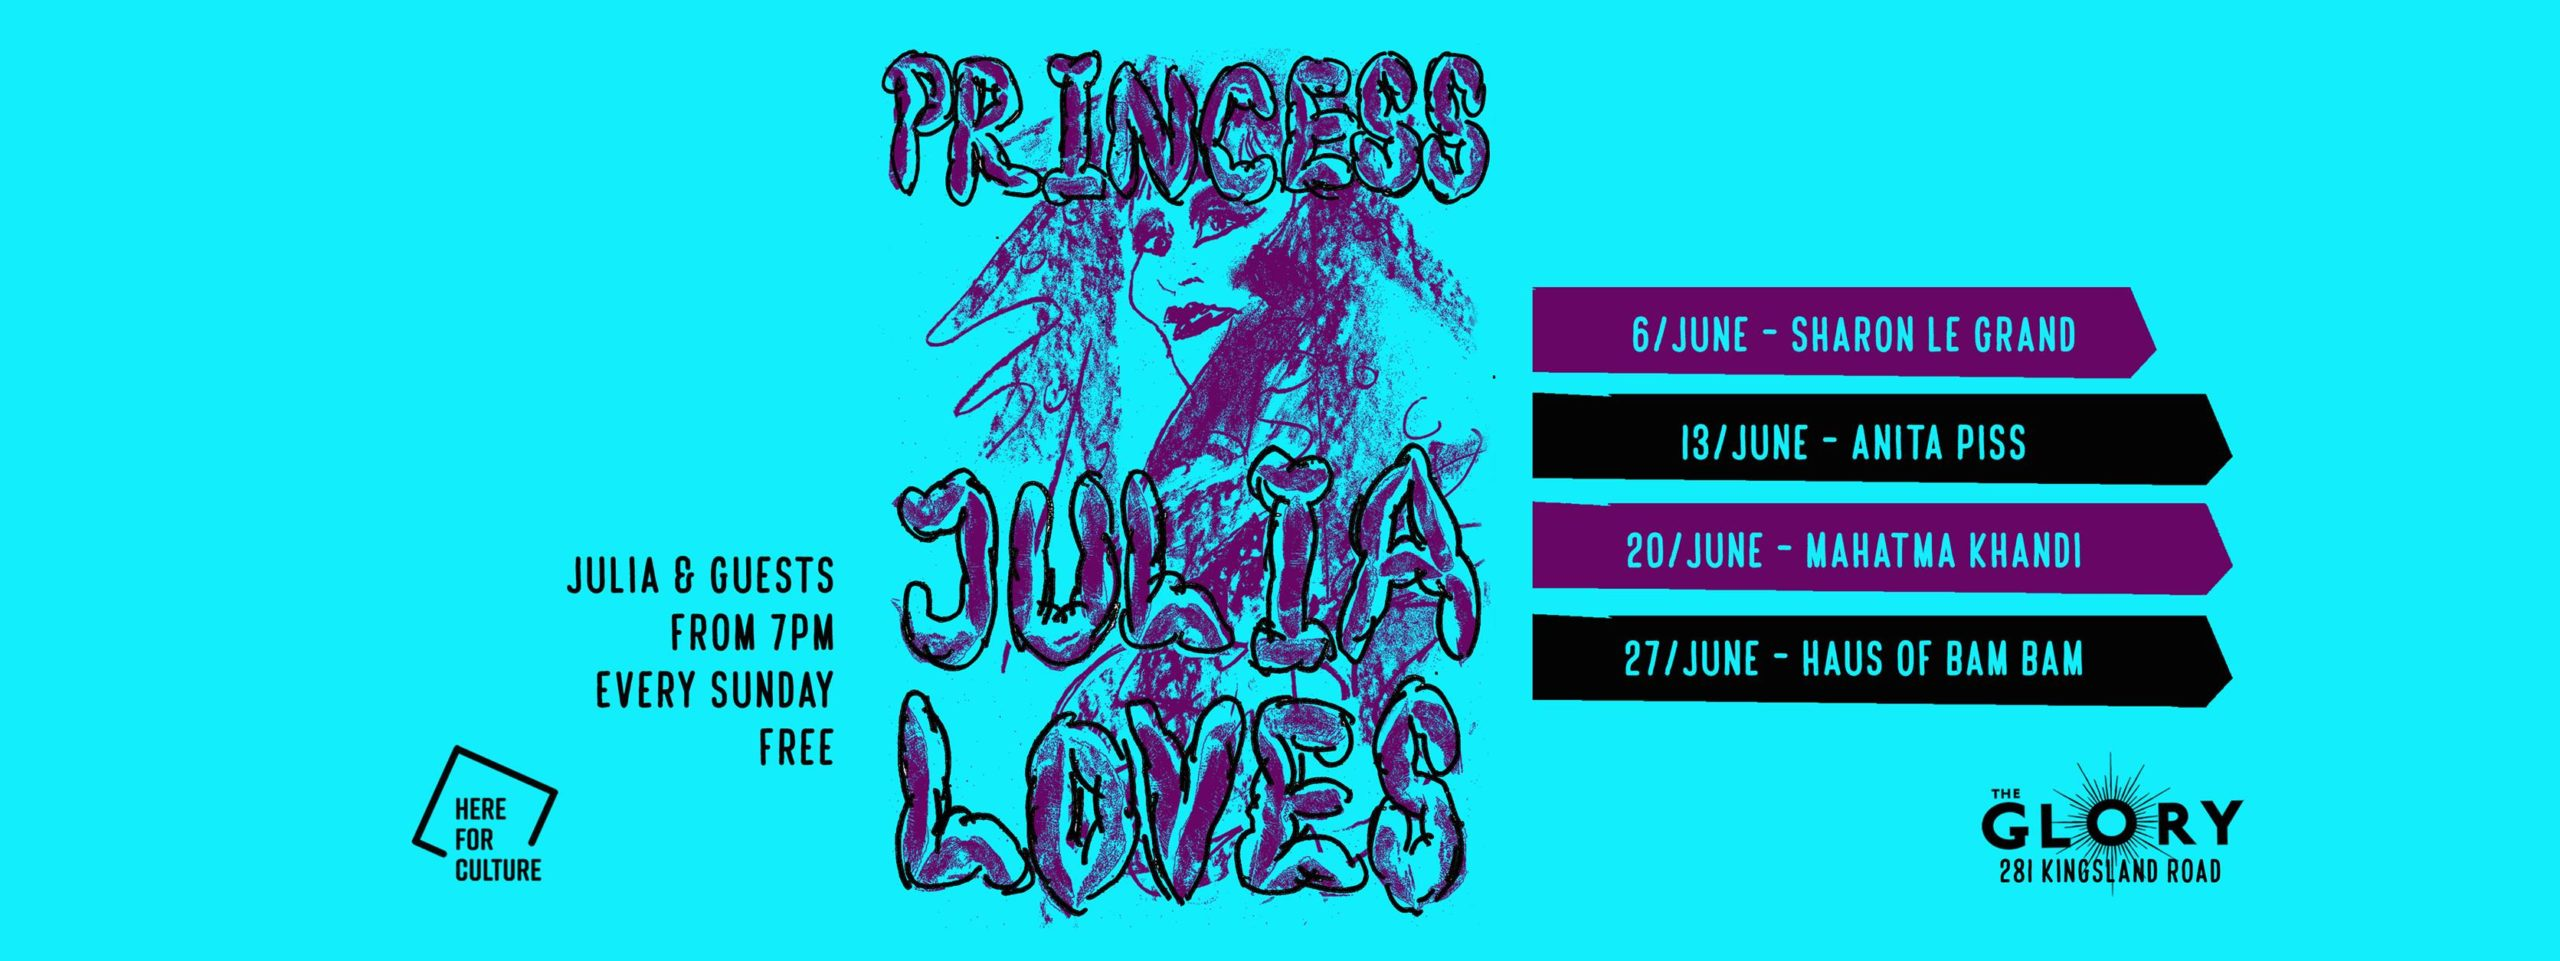 Princess Julia Loves Haus of Bam Bam